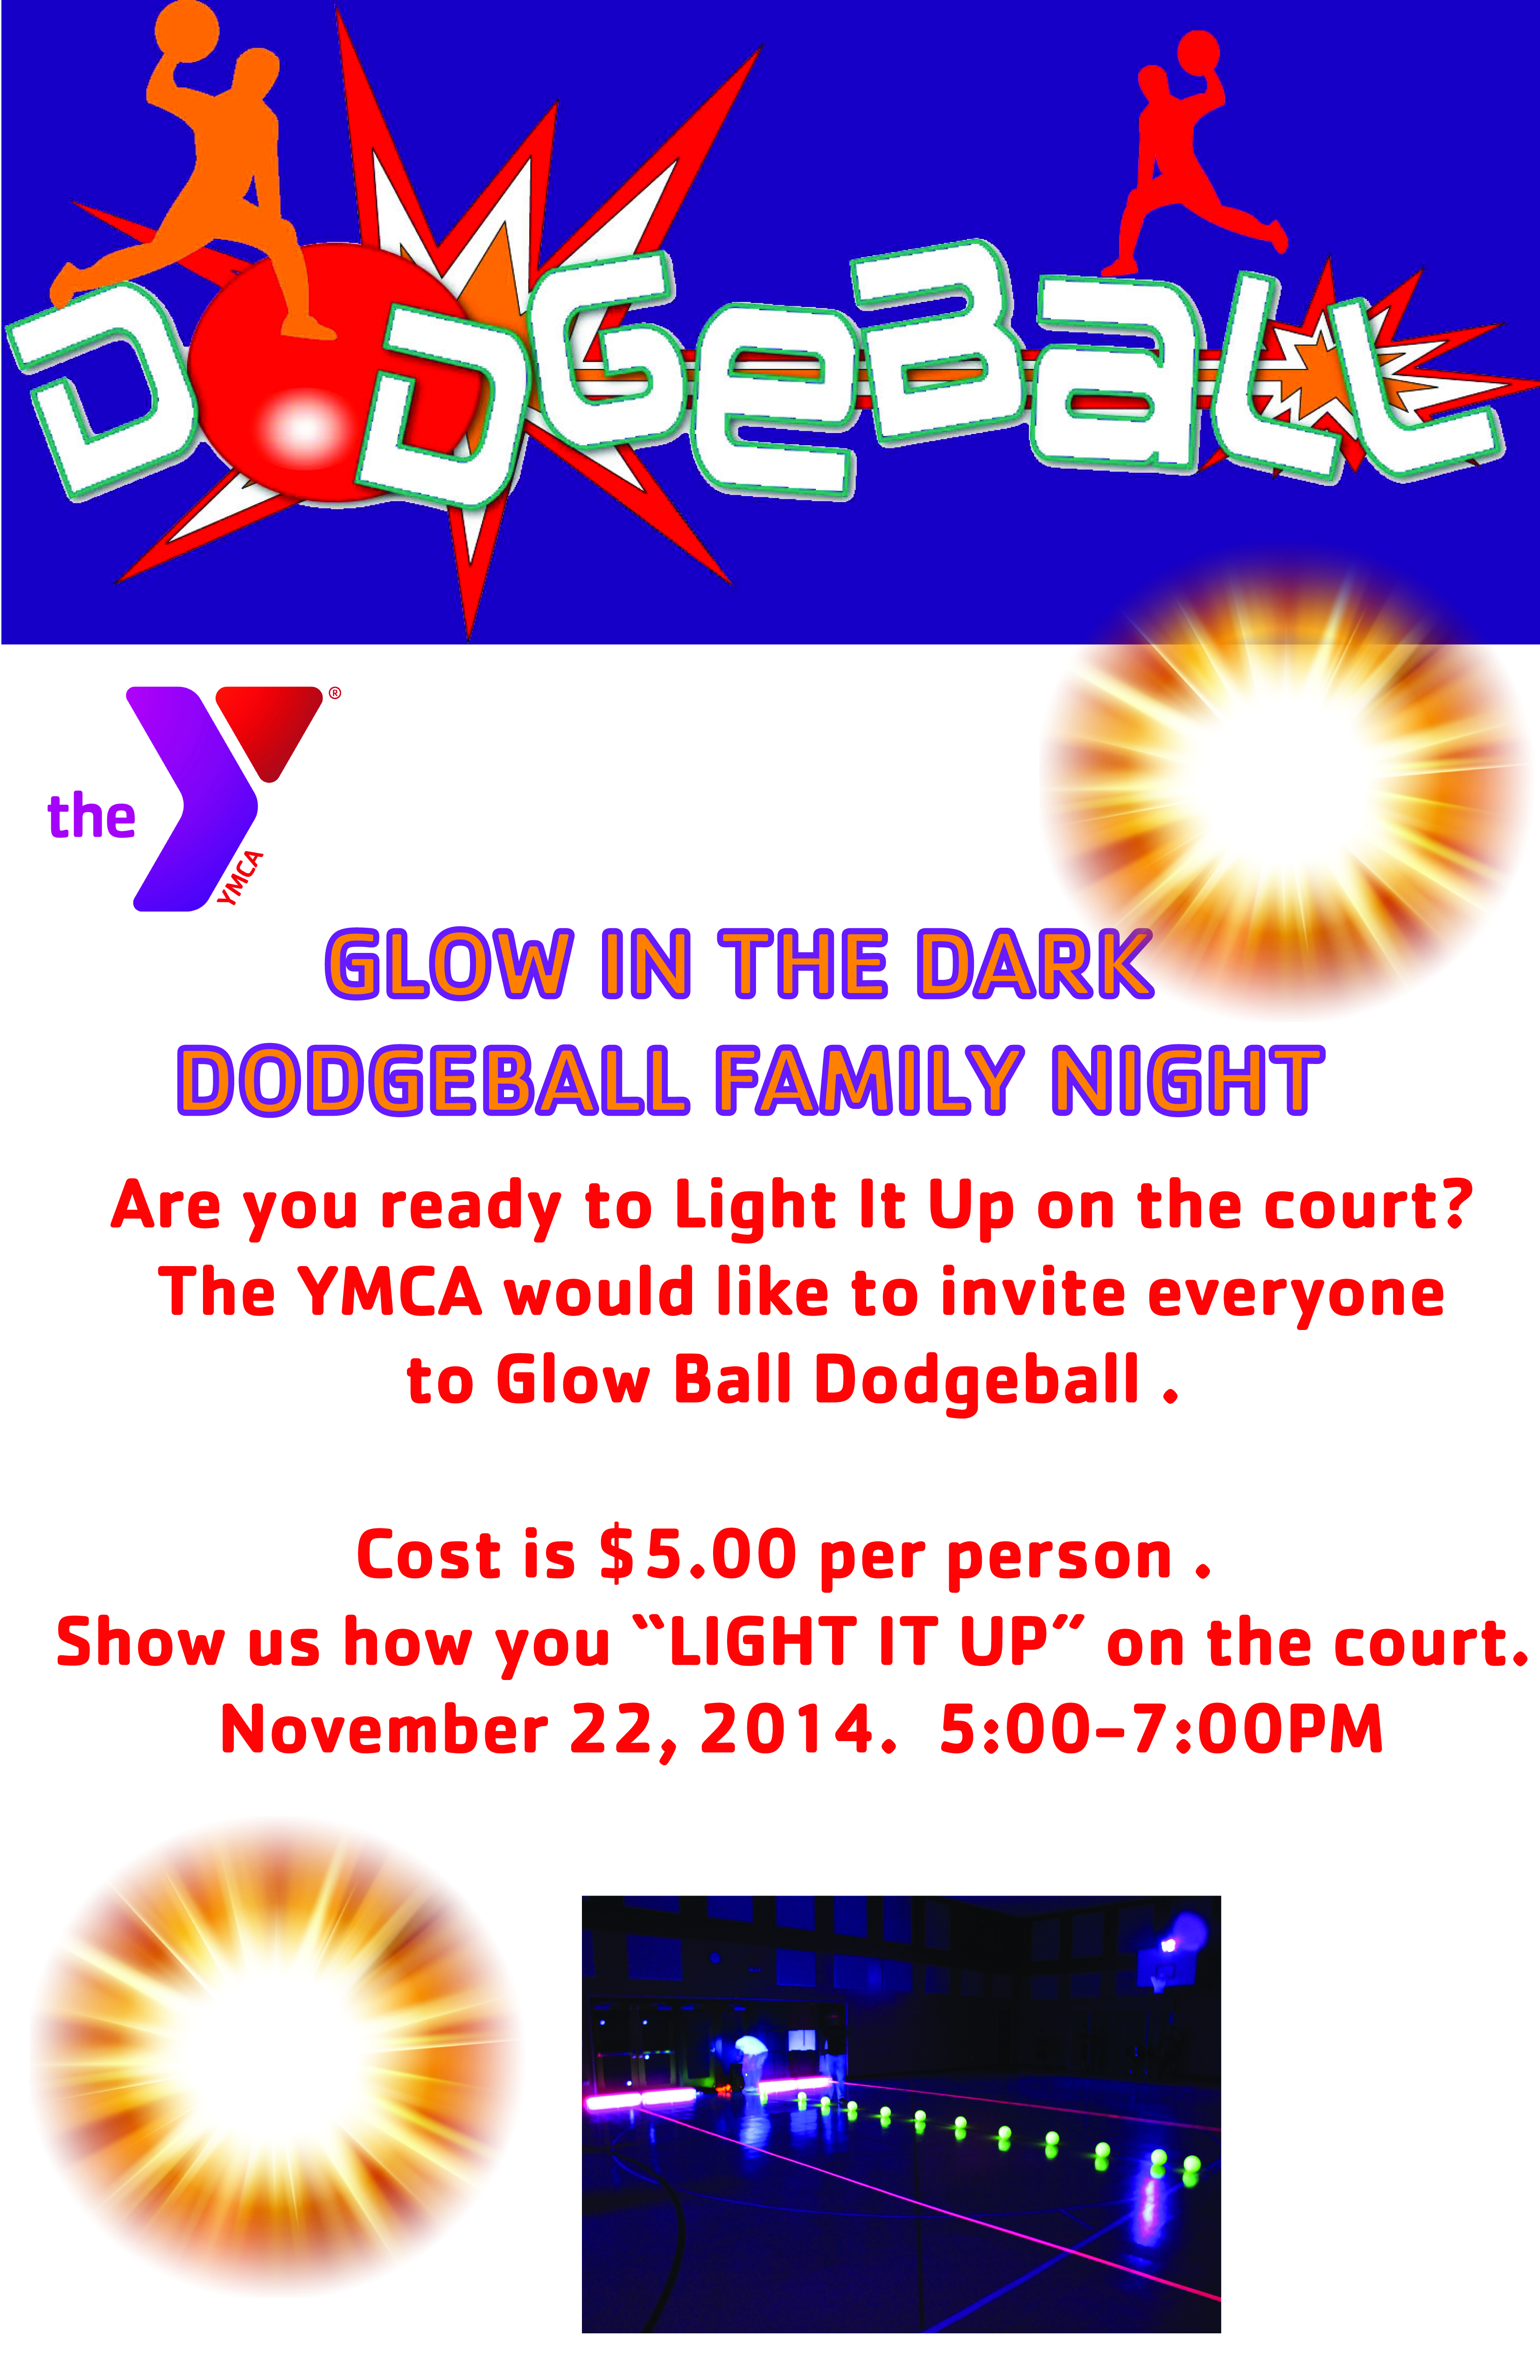 Glow in the Dark Dodgeball Family Night - Ottawa Illinois ...